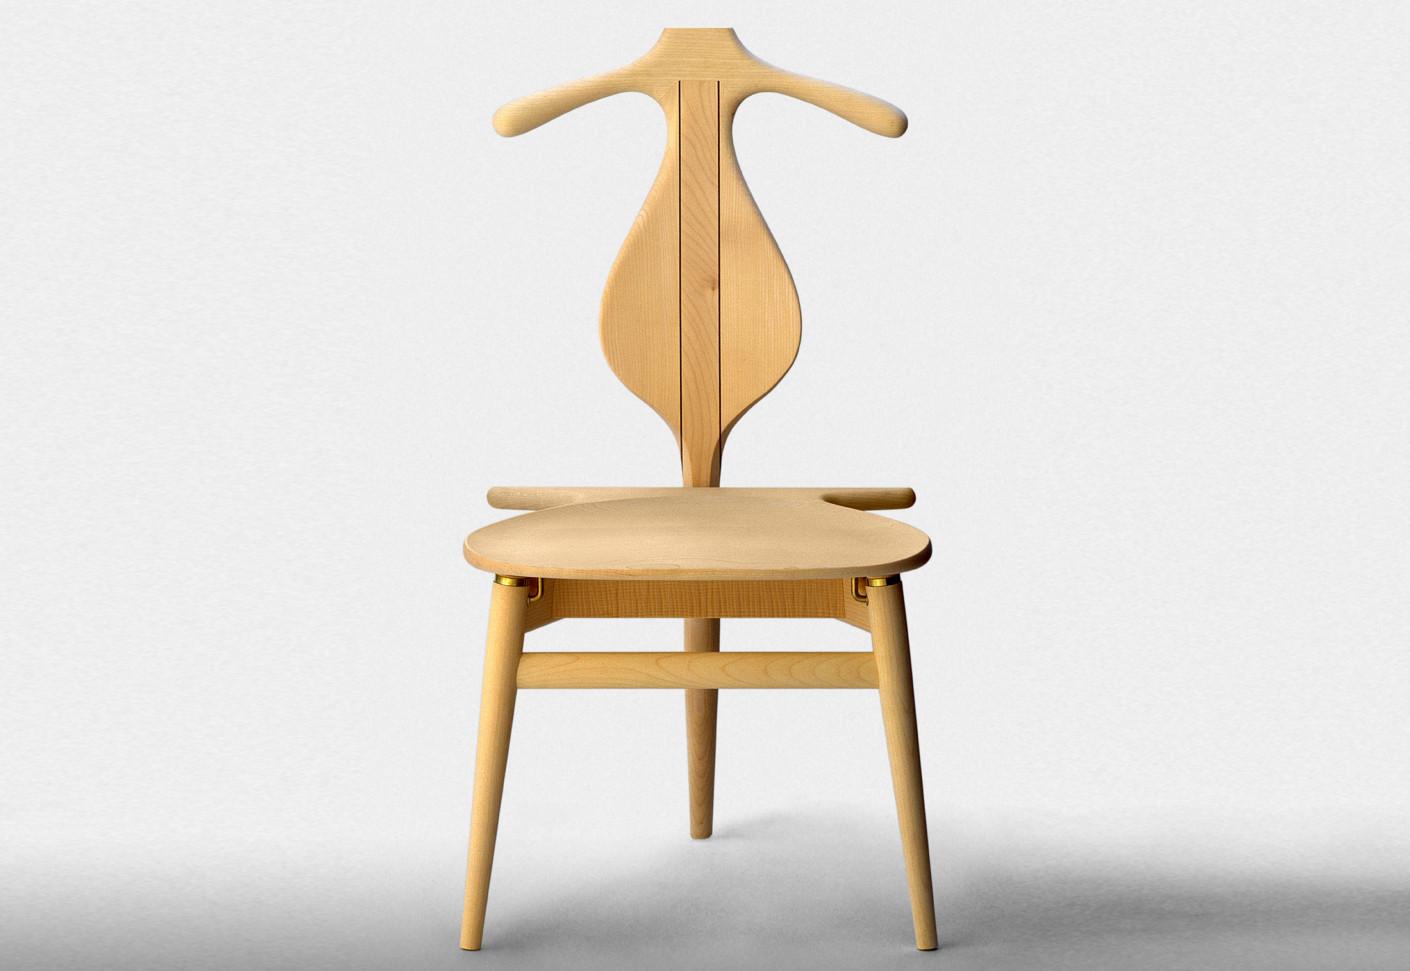 Foldin Chairs Images Diy Folding